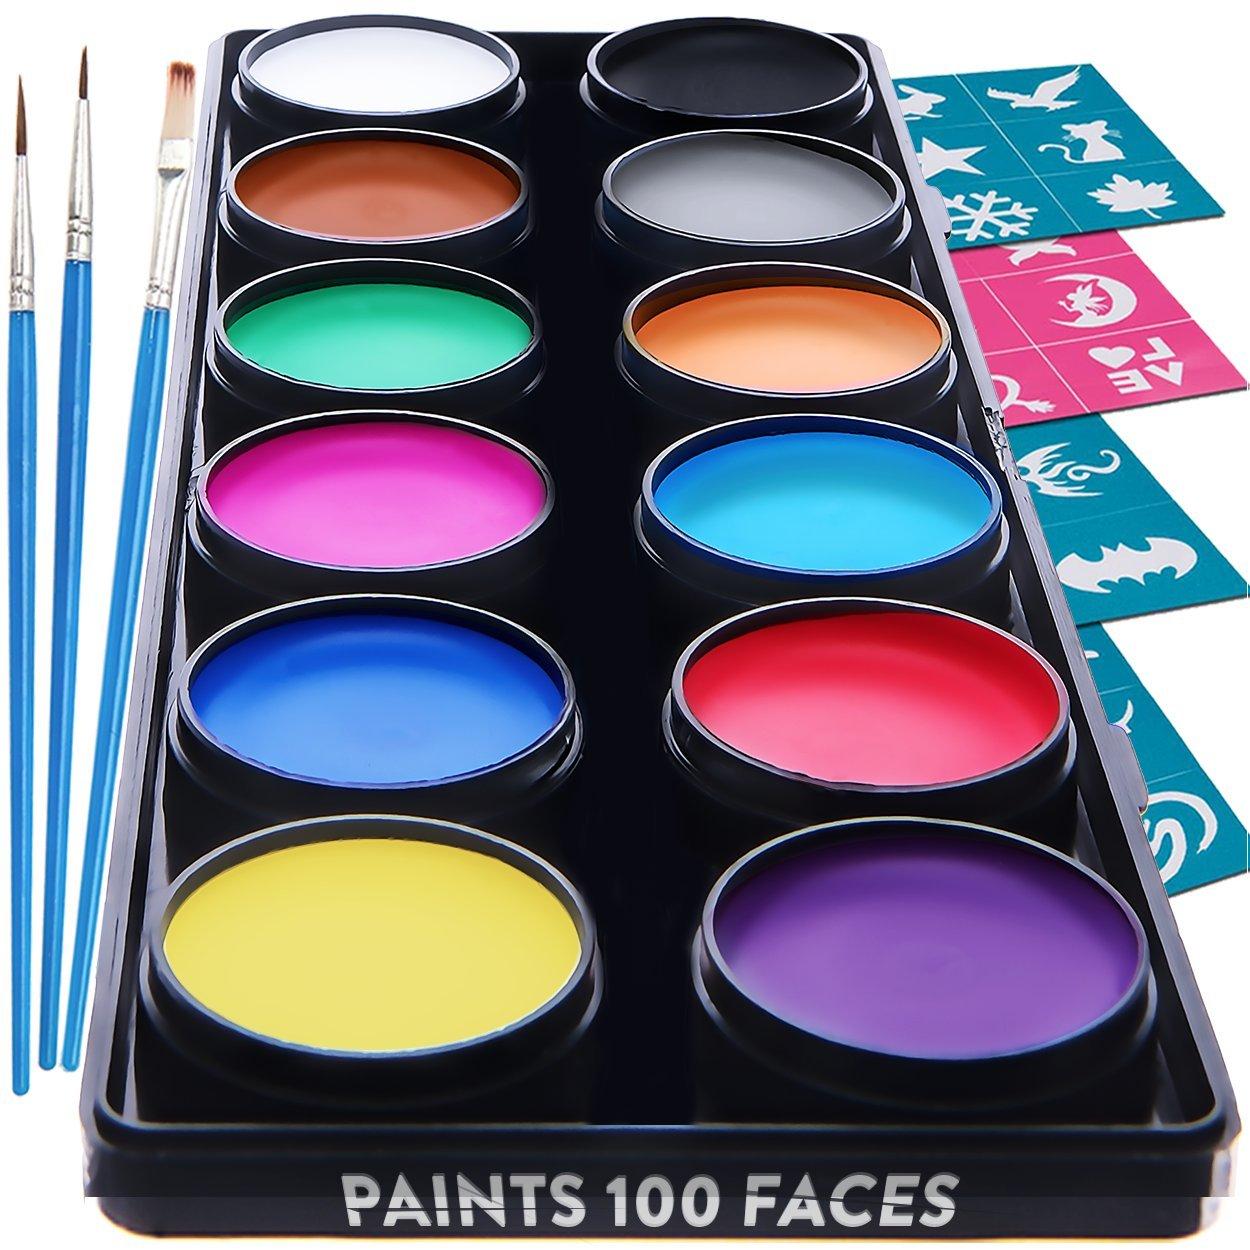 5f0ab48f7 Pintura Facial Para Disfraces, Maquillaje Color Kit de Pintura Facial &  Corporal de alta Calidad